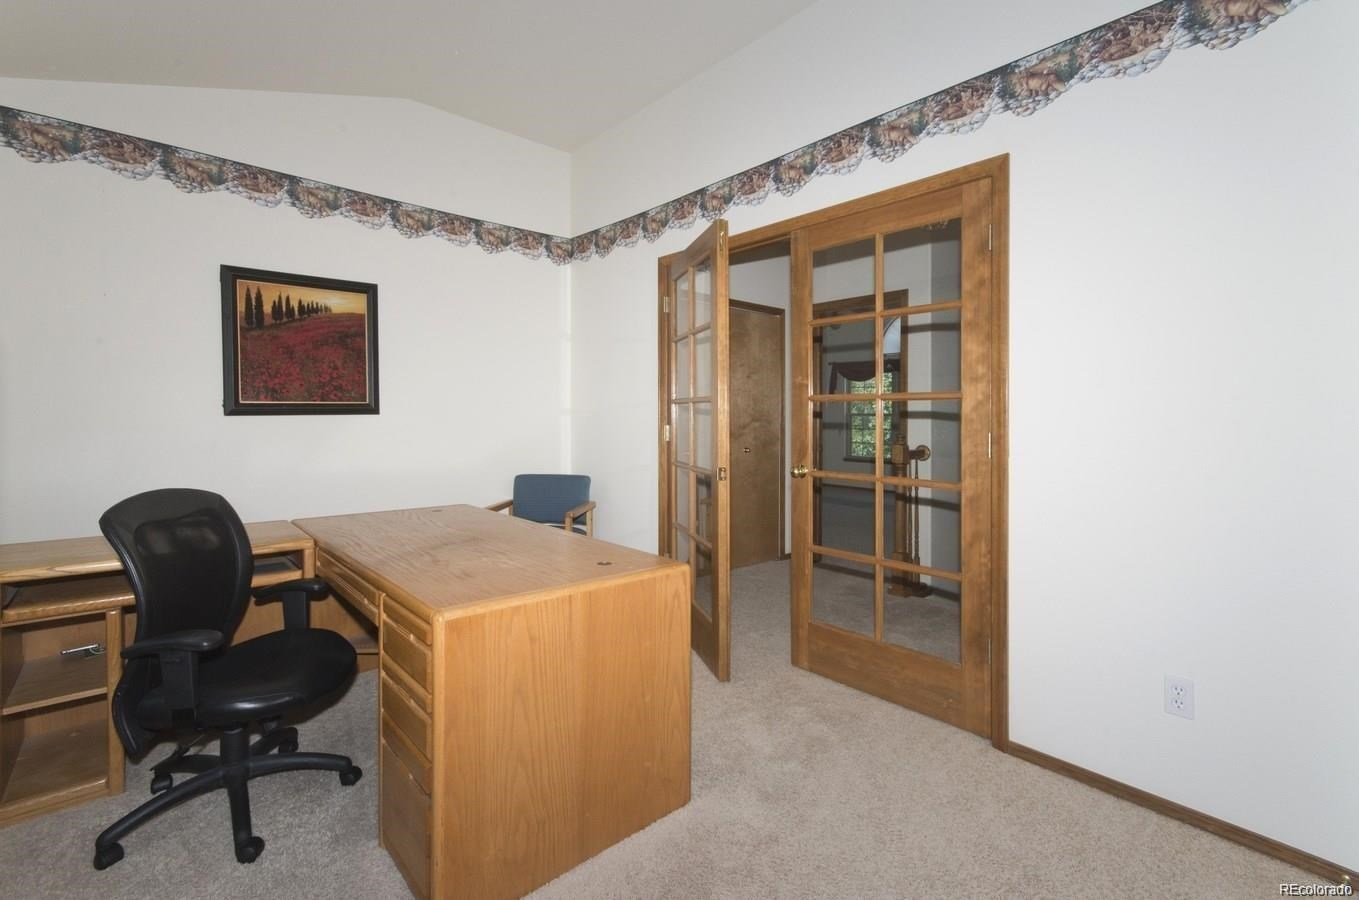 MLS# 3959906 - 1 - 9045  Tuscany Way, Colorado Springs, CO 80920